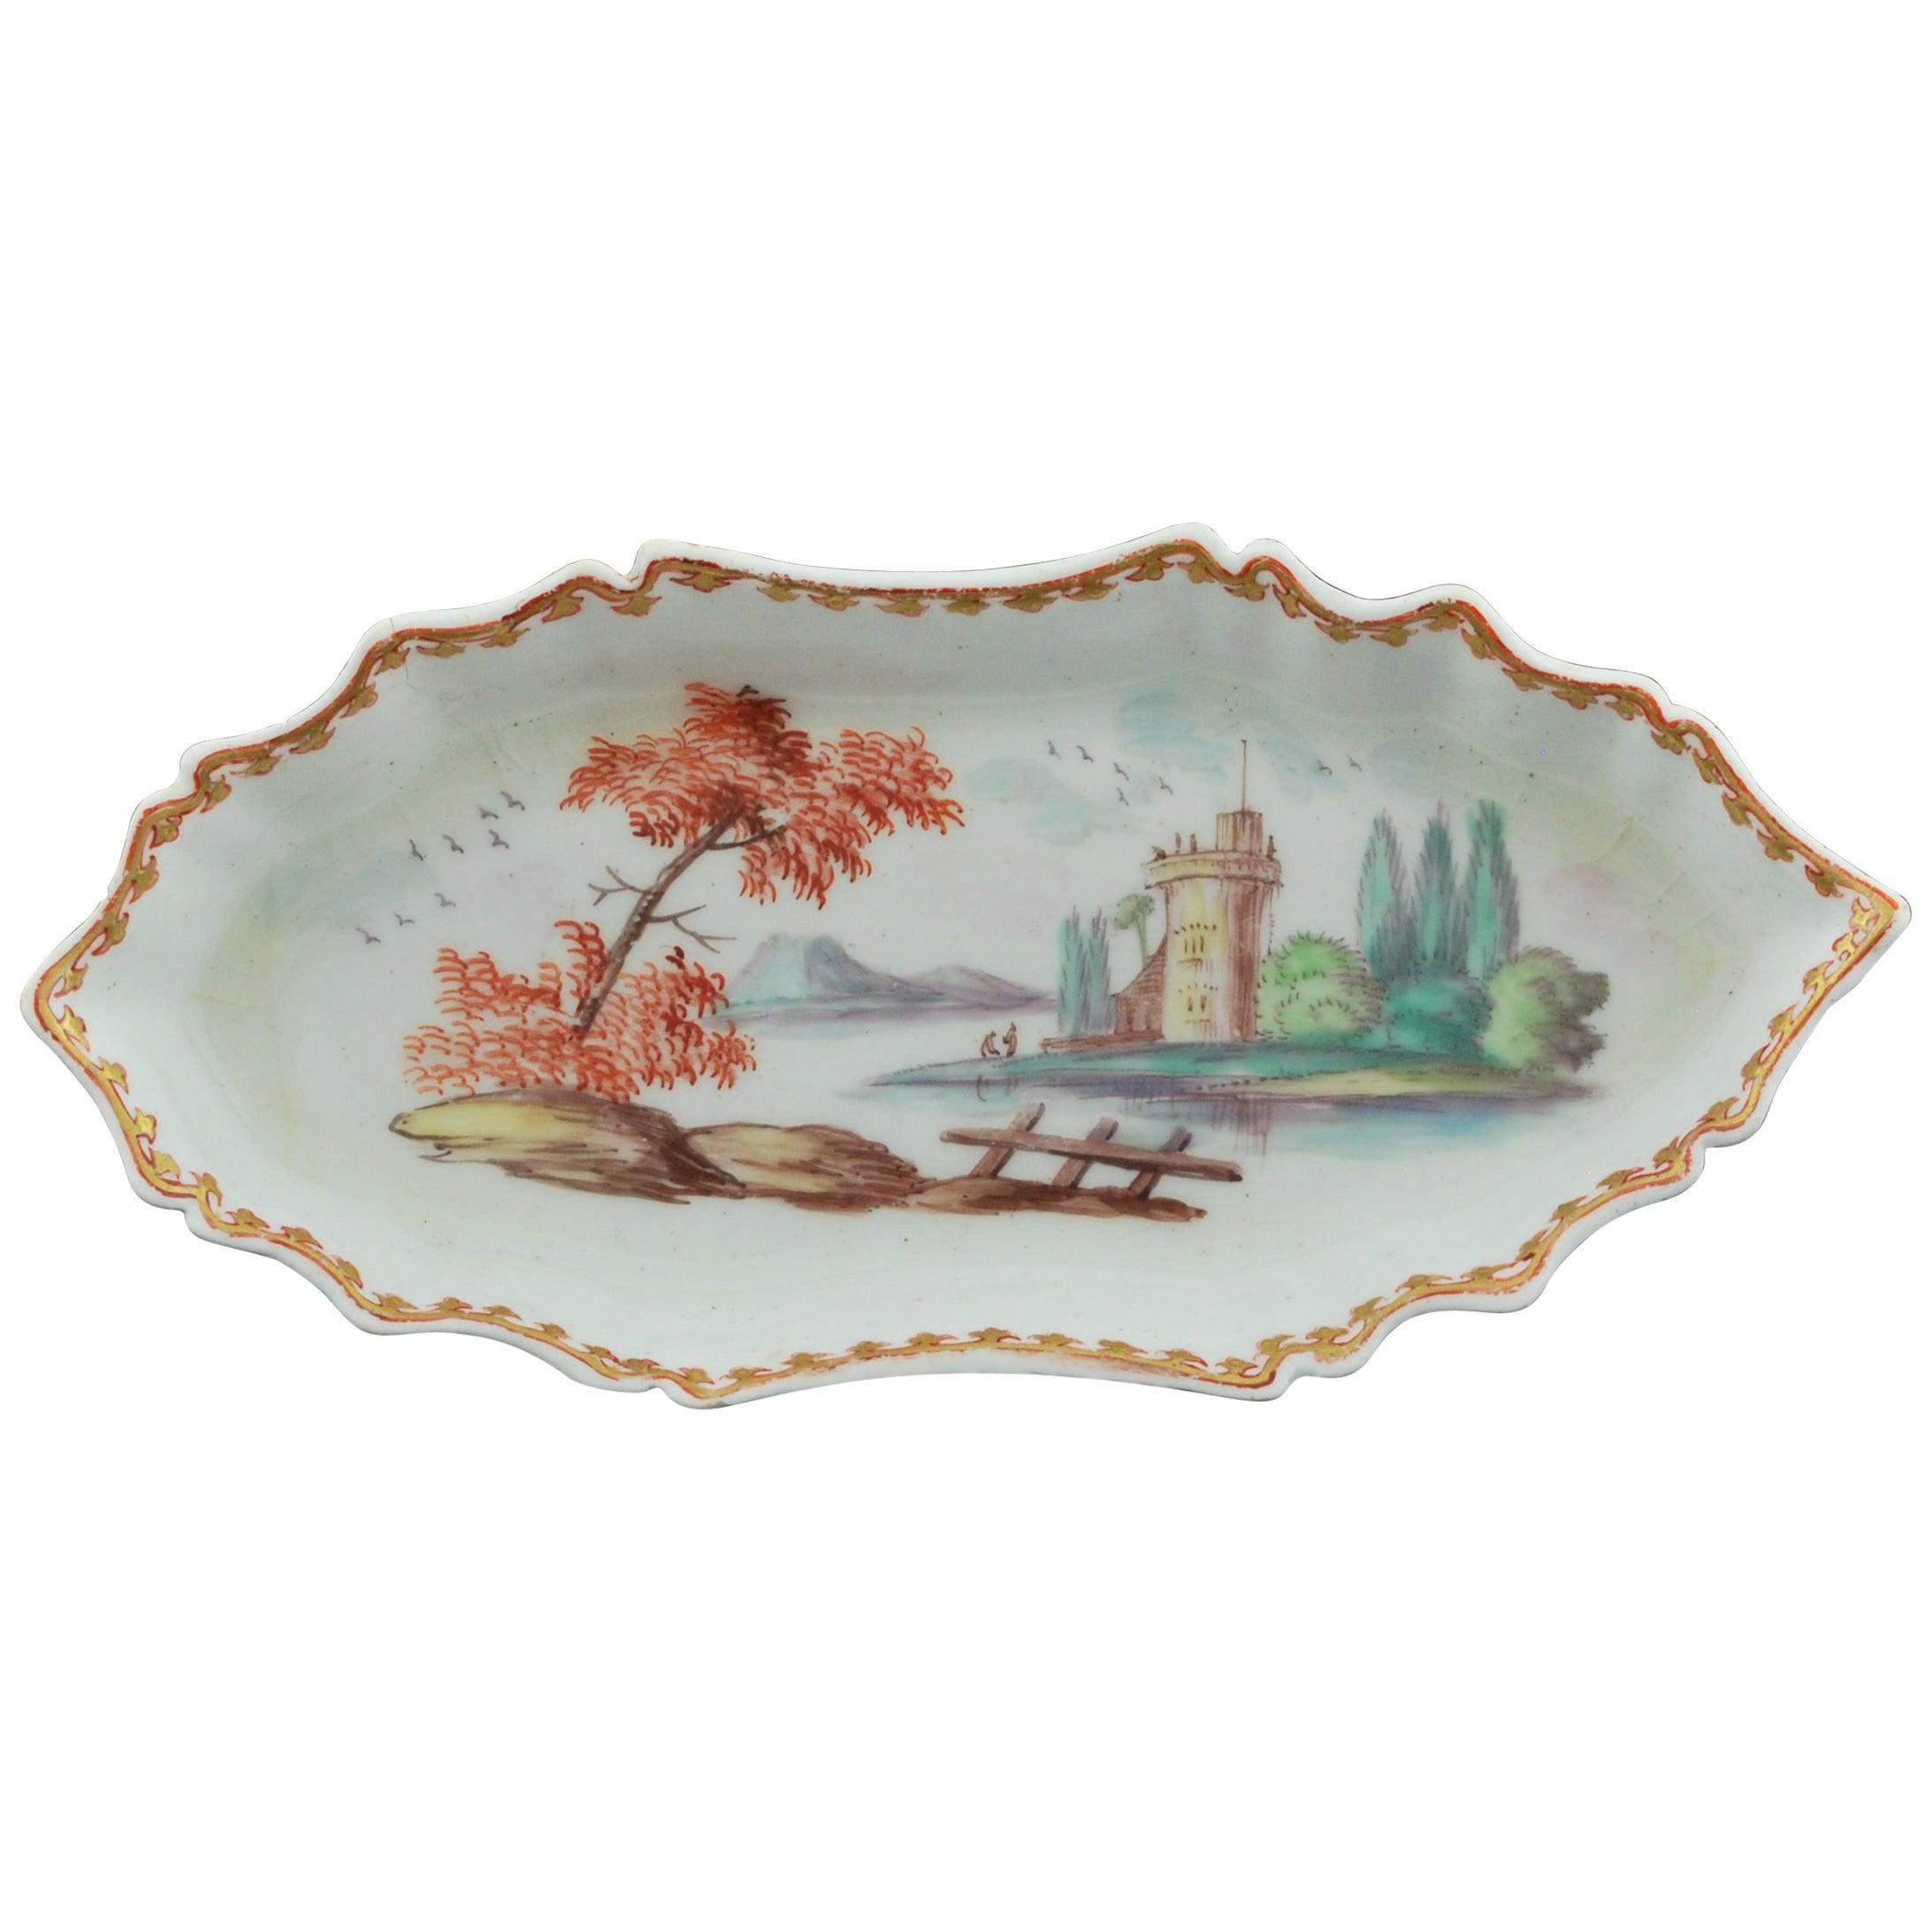 Spoon Tray, Decorated by James Hammett O'neale, Bow, circa 1760